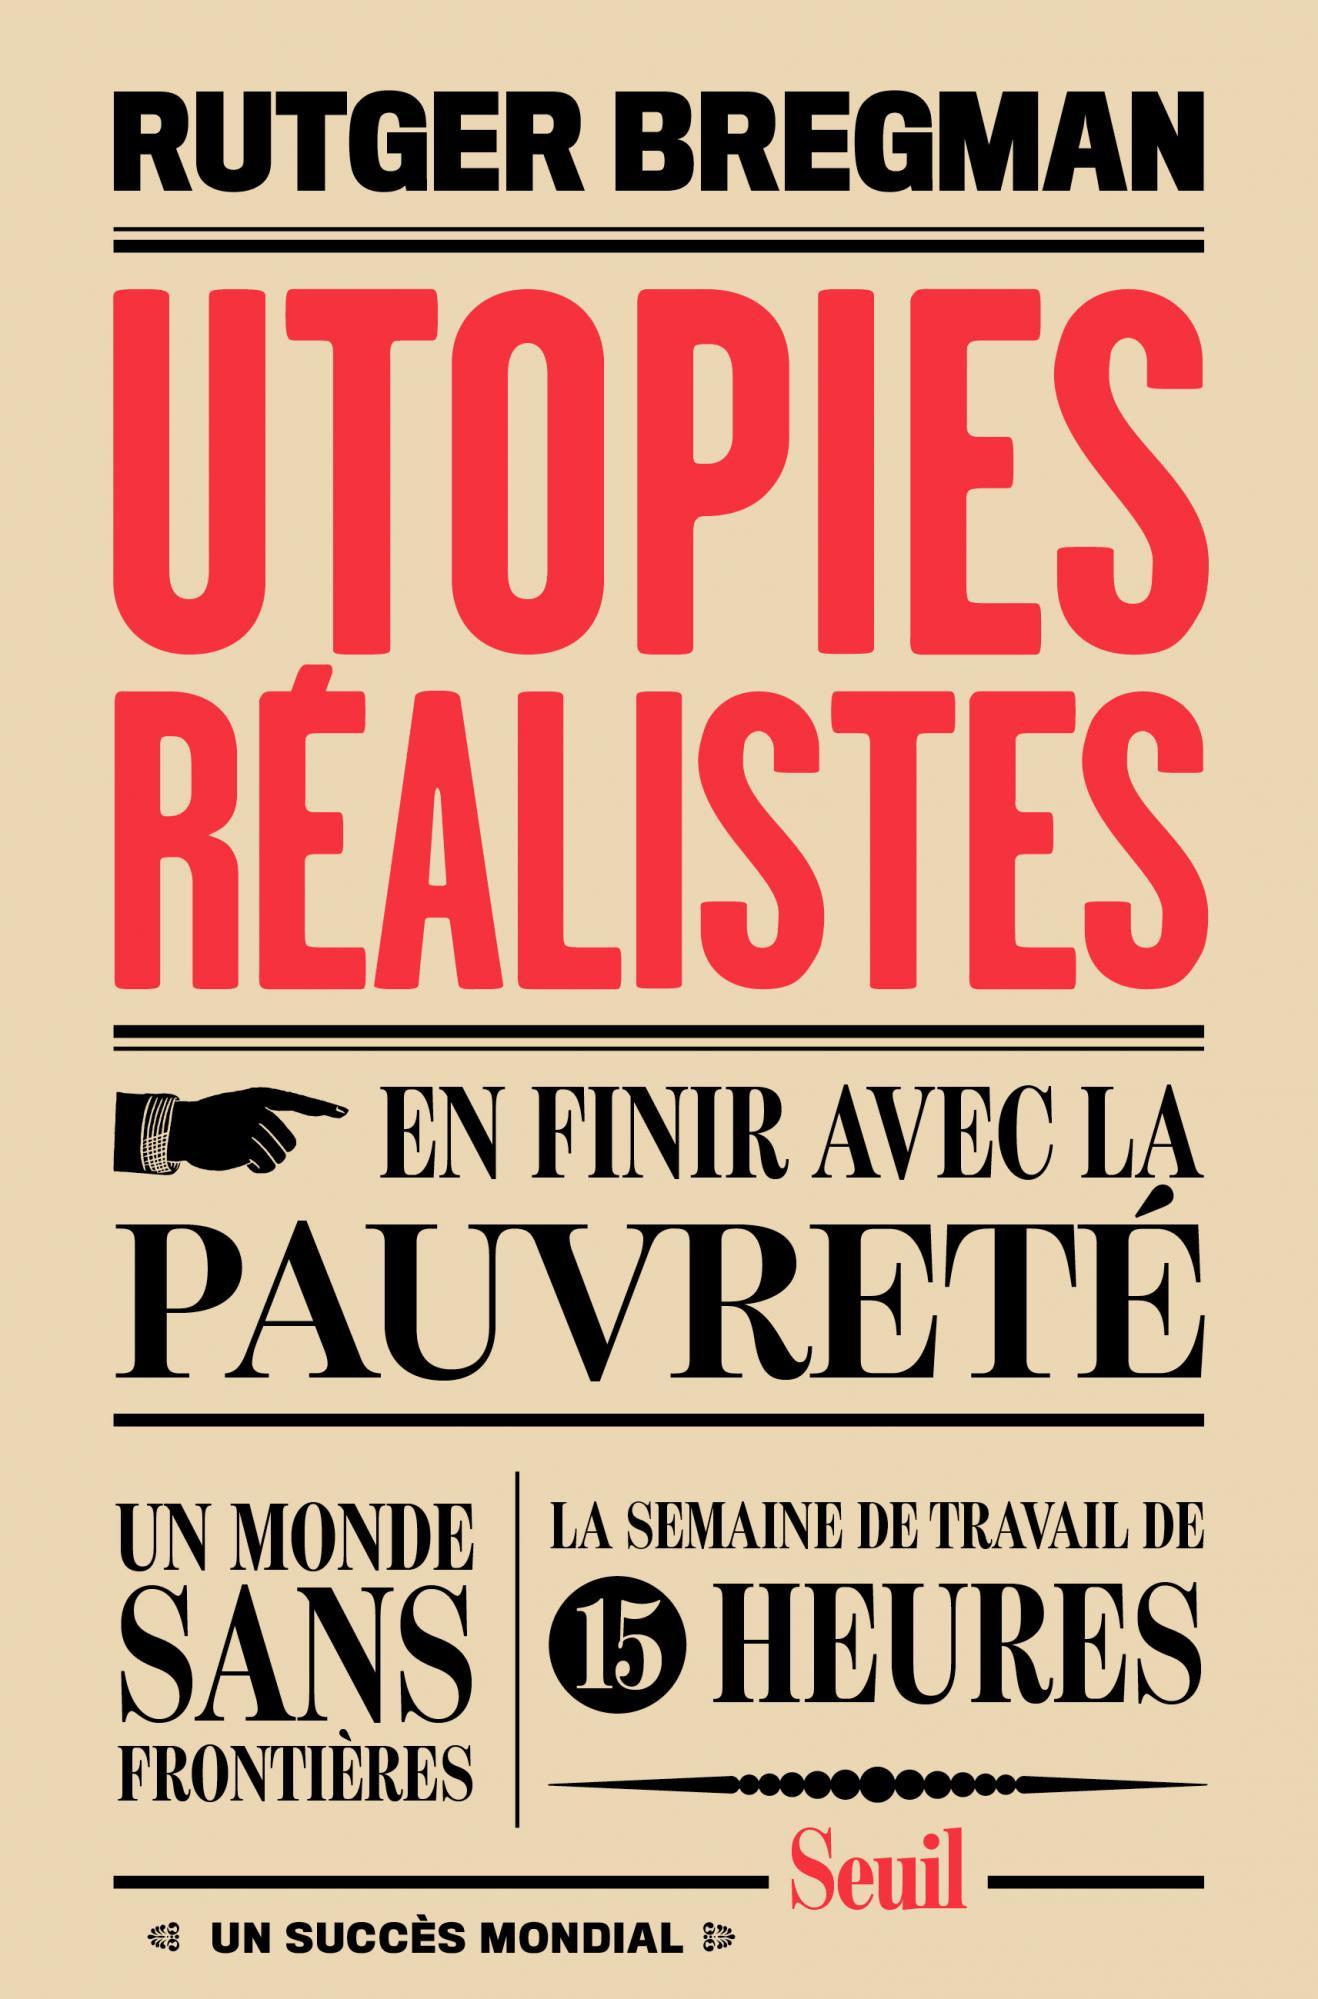 R. Bregman, Utopies réalistes